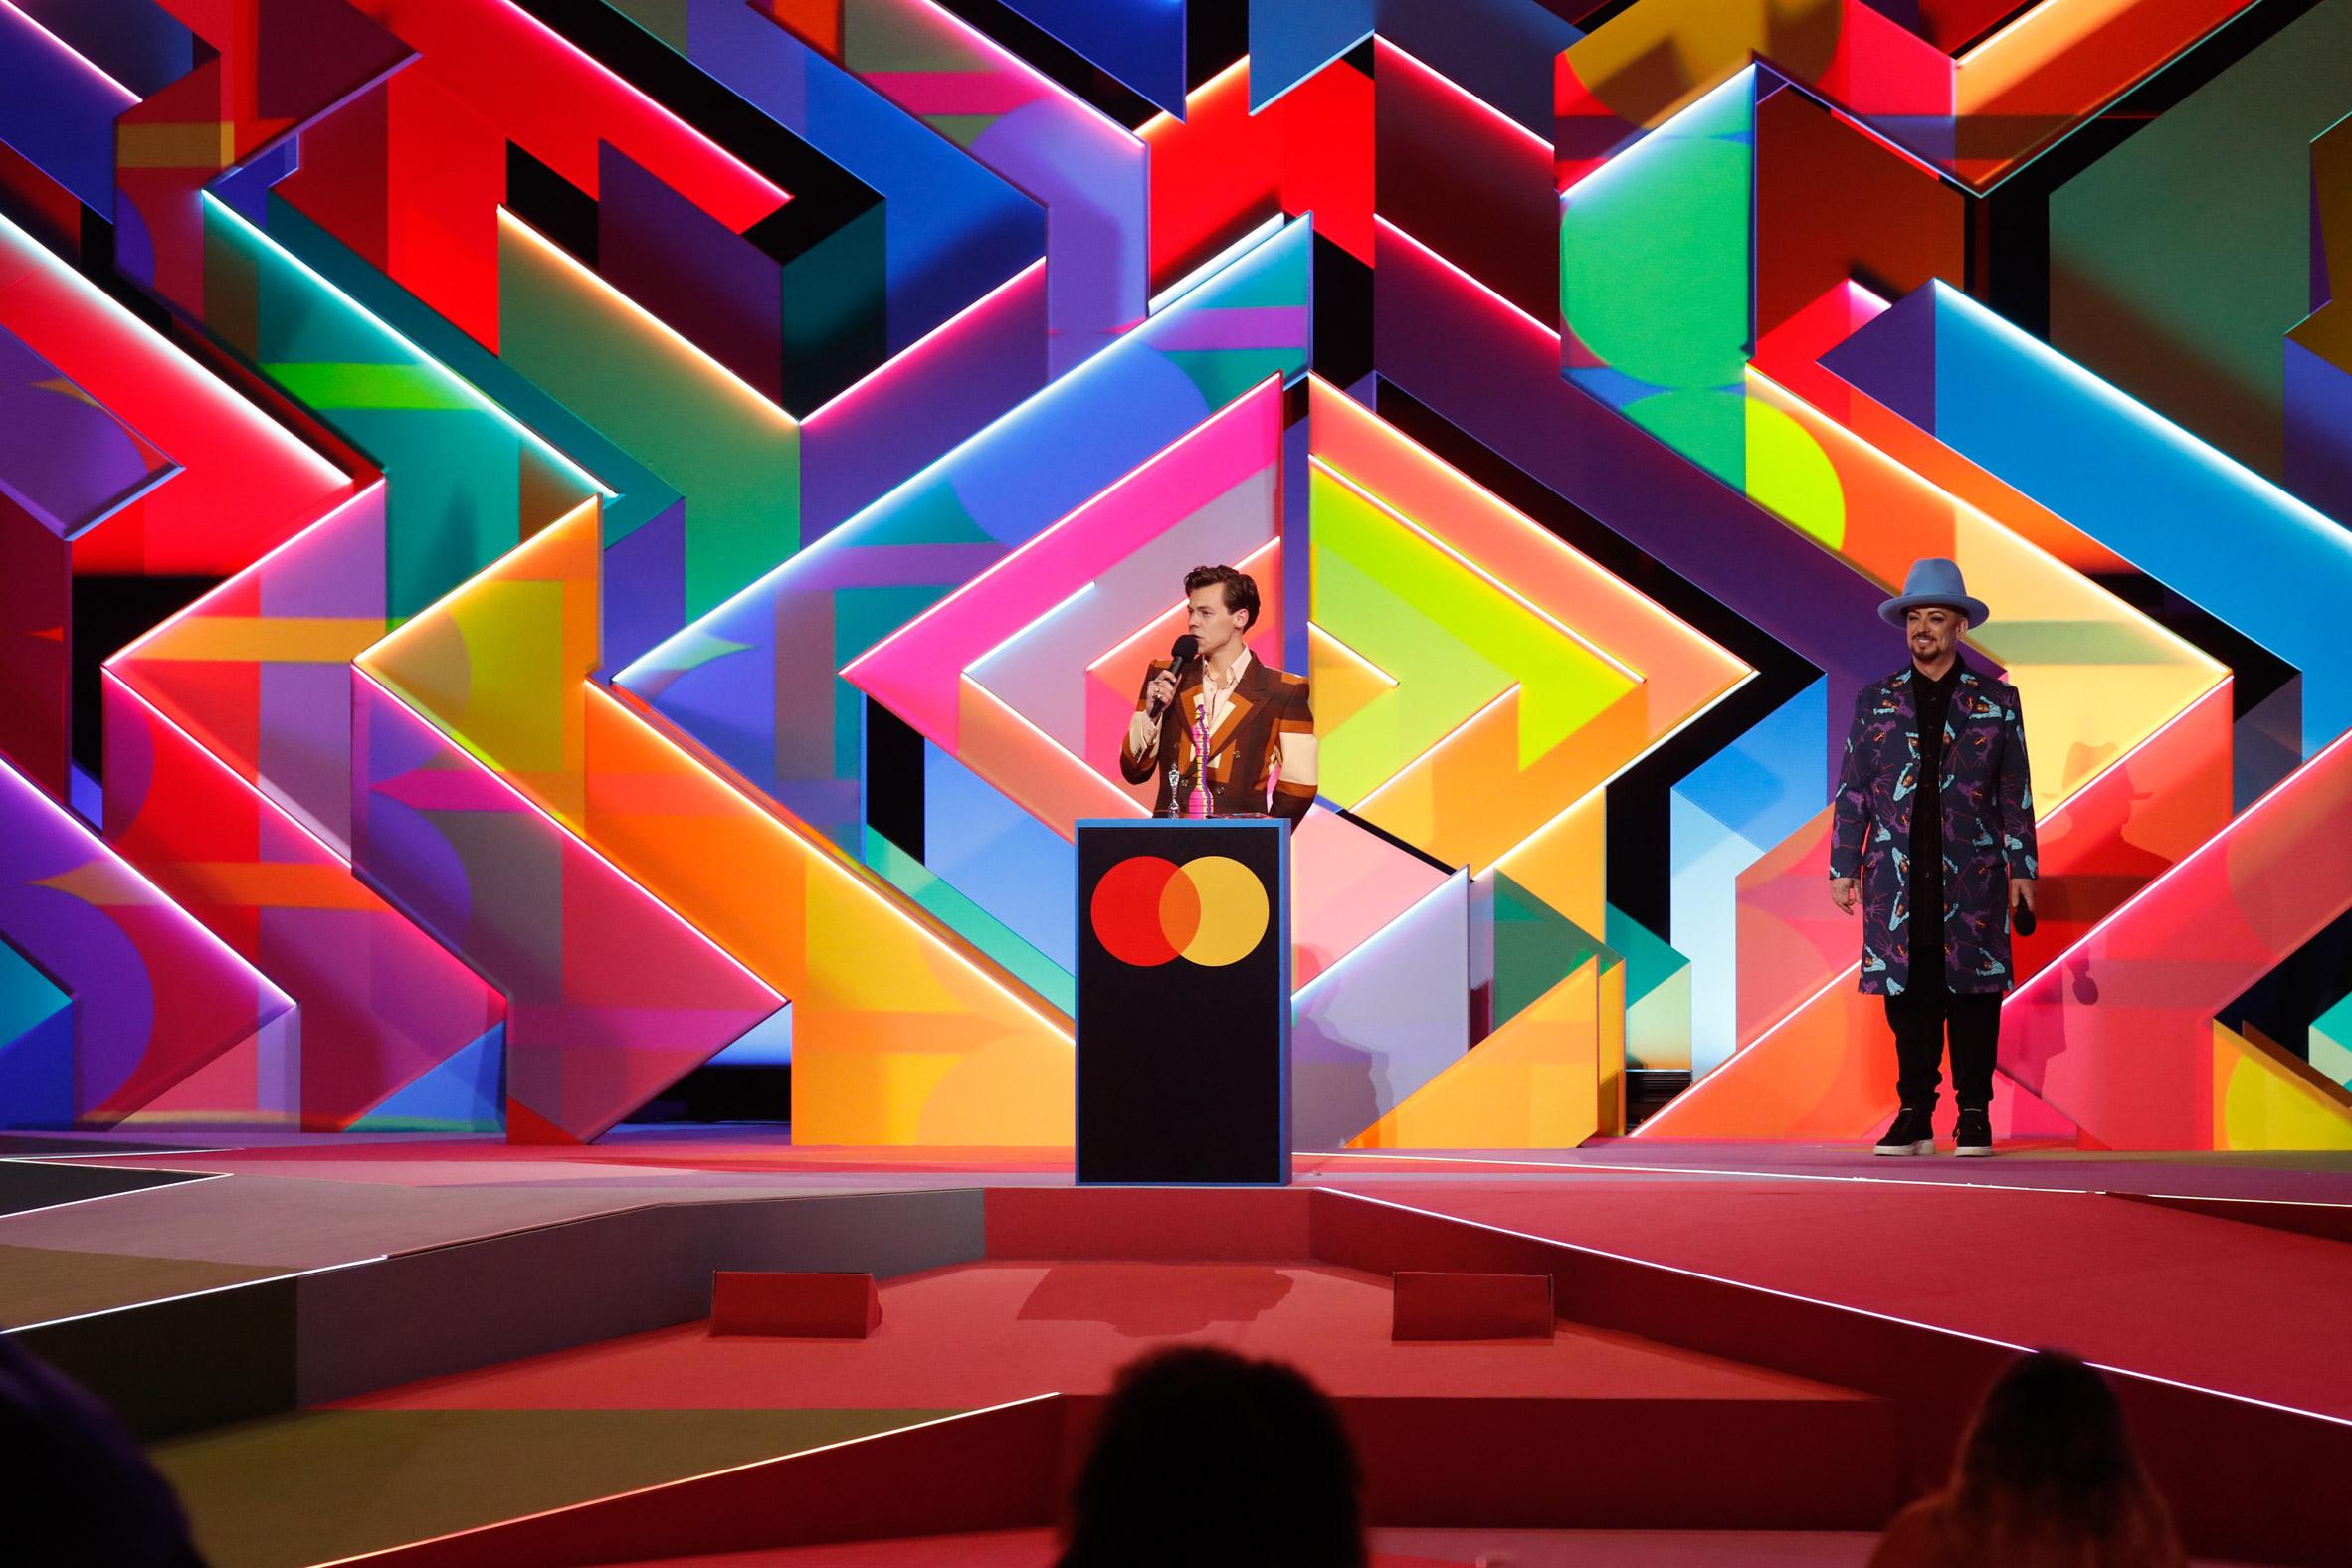 Harry Styles in front of Es Devlin's set design for Brit Awards 2021